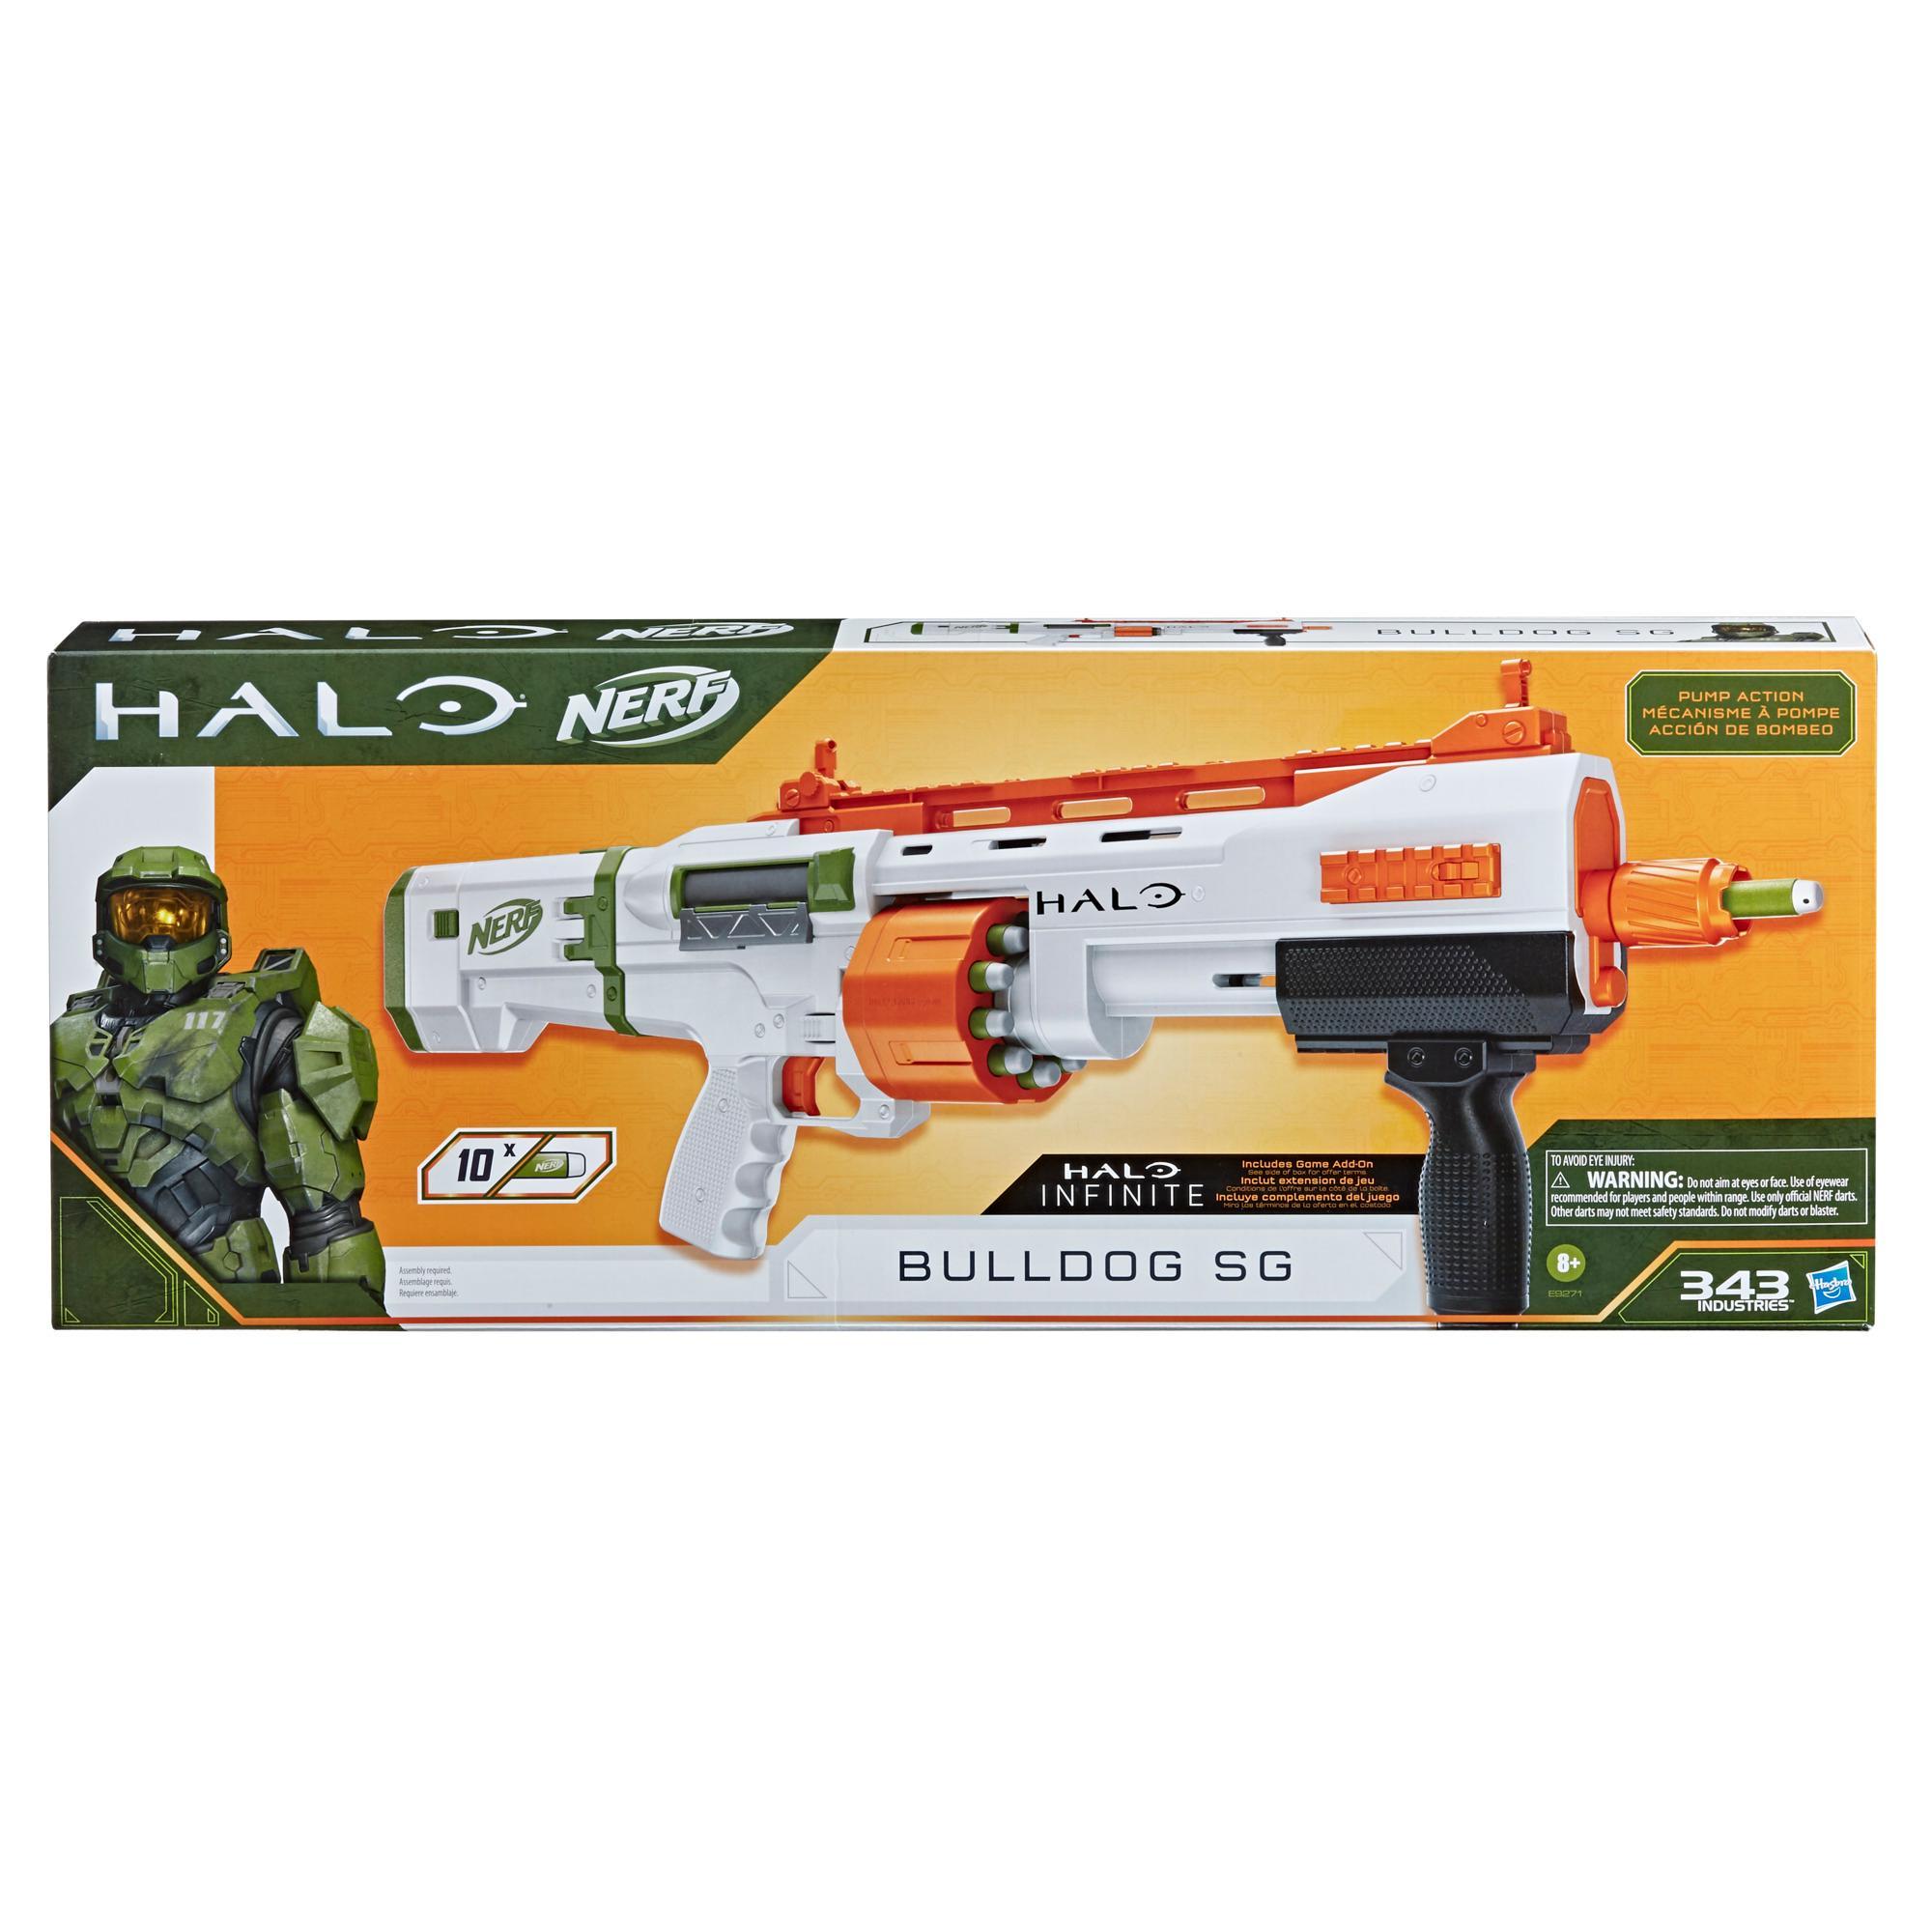 Nerf Halo Bulldog SG Dart Blaster -- Pump-Action, Rotating 10-Dart Drum, Tactical Rails, 10 Nerf Darts, Skin Unlock Code